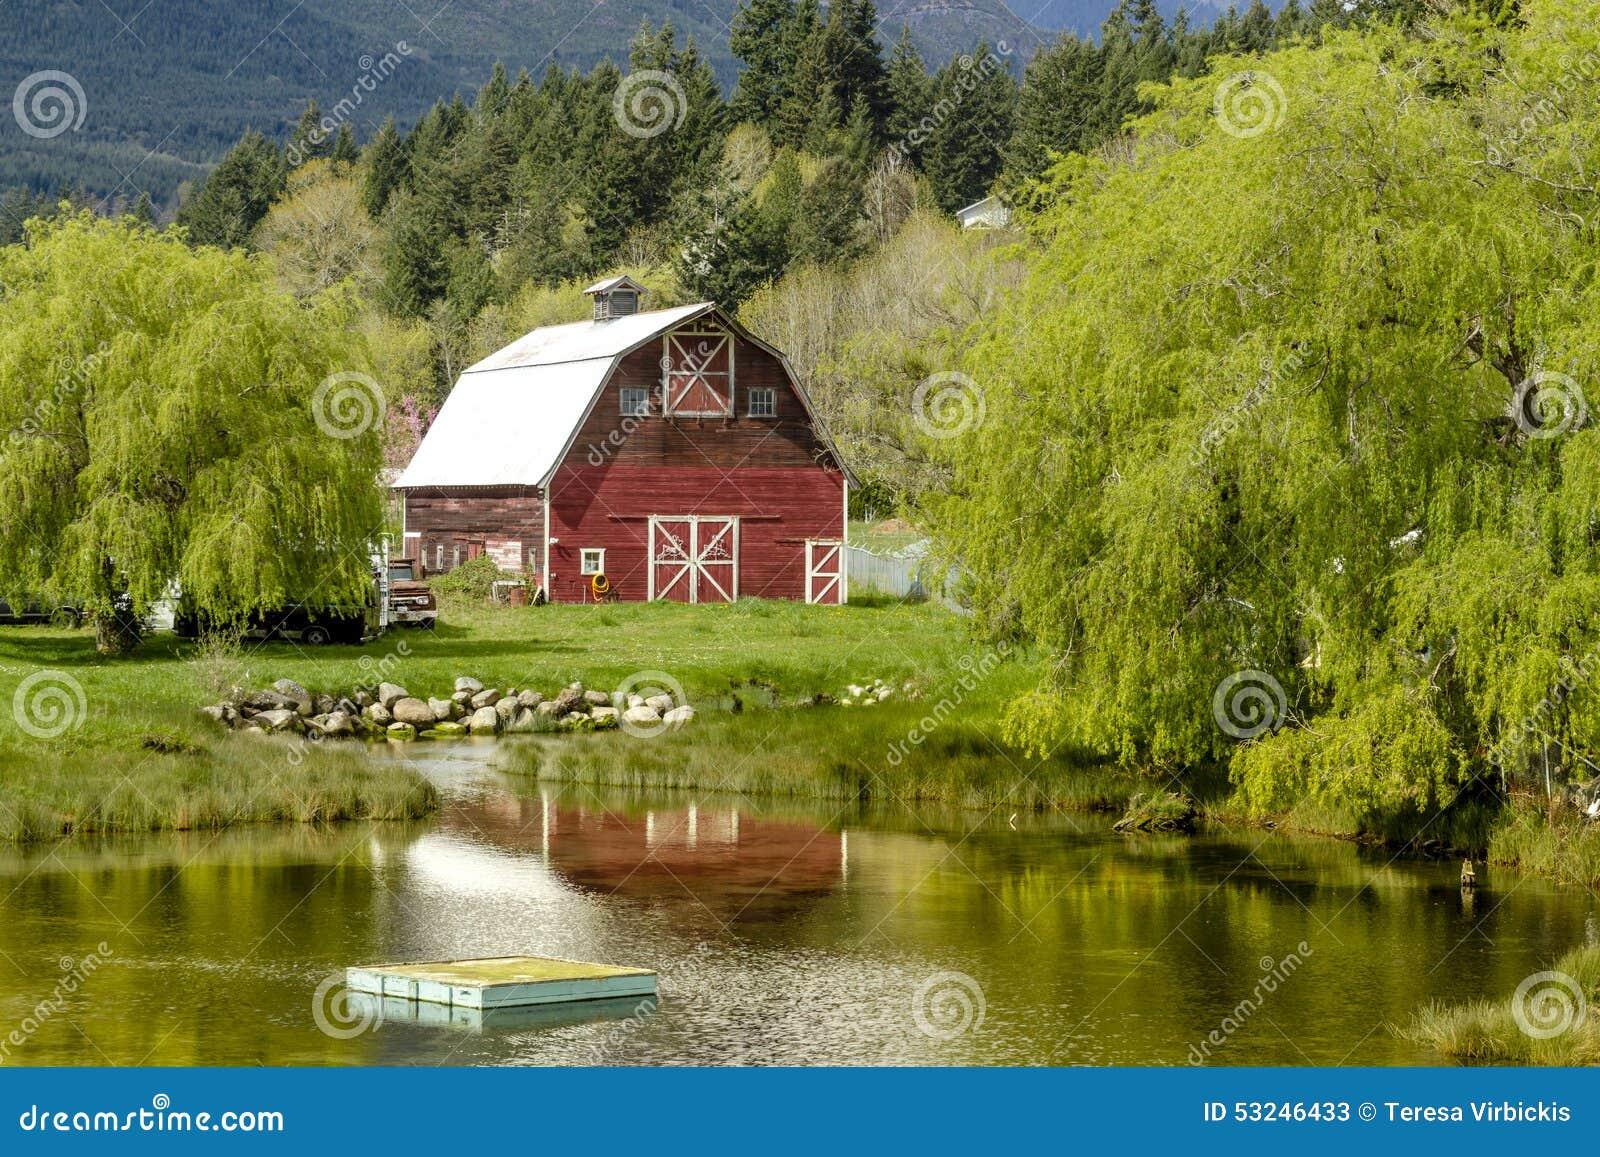 Brinnon Washington Barn By Pond Stock Image - Image of ...